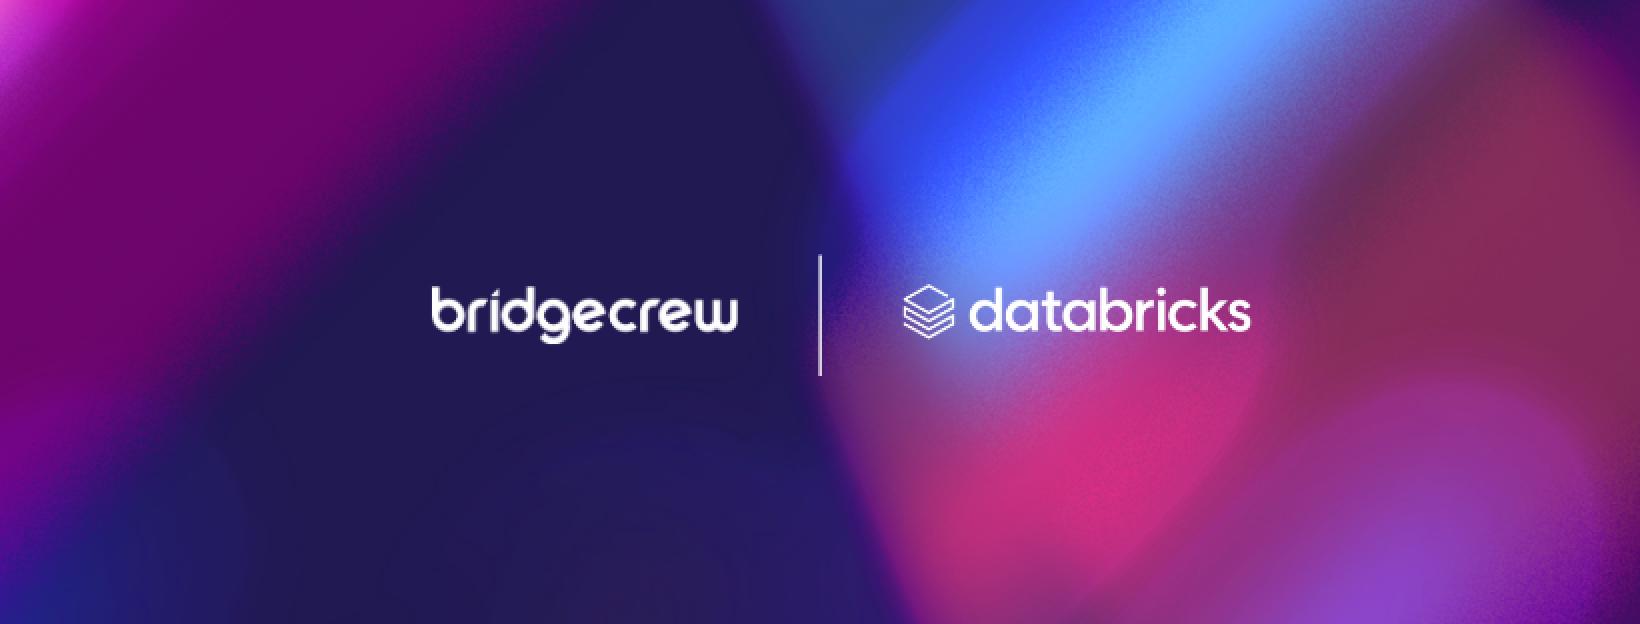 Databricks IAM right-sizing and building security foundation with Bridgecrew